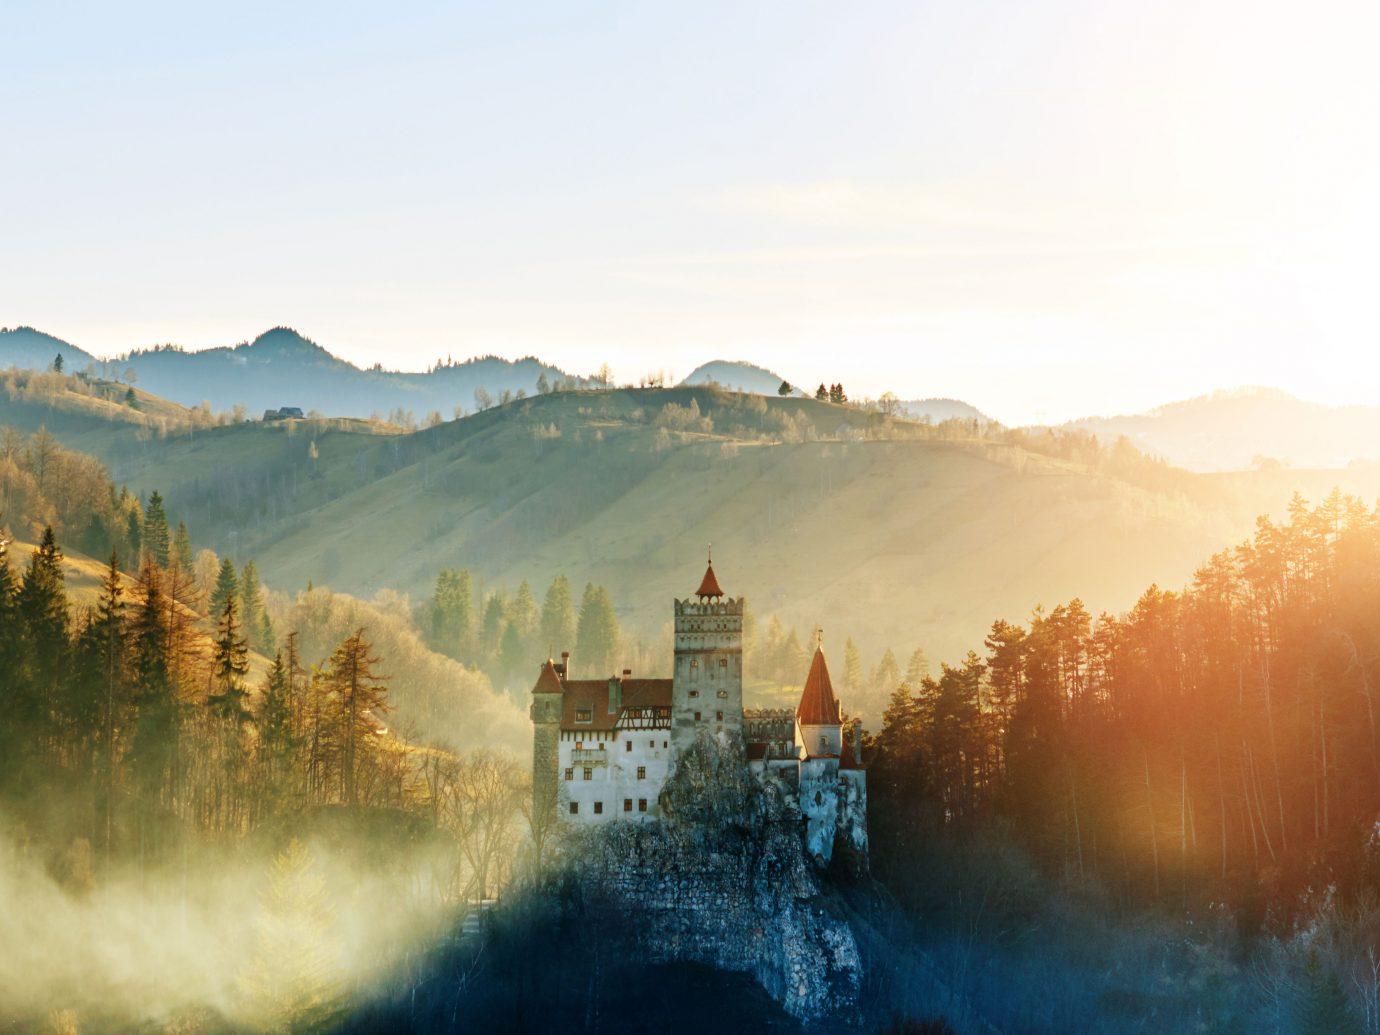 Bran Castle on a hilltop during a misty sunrise